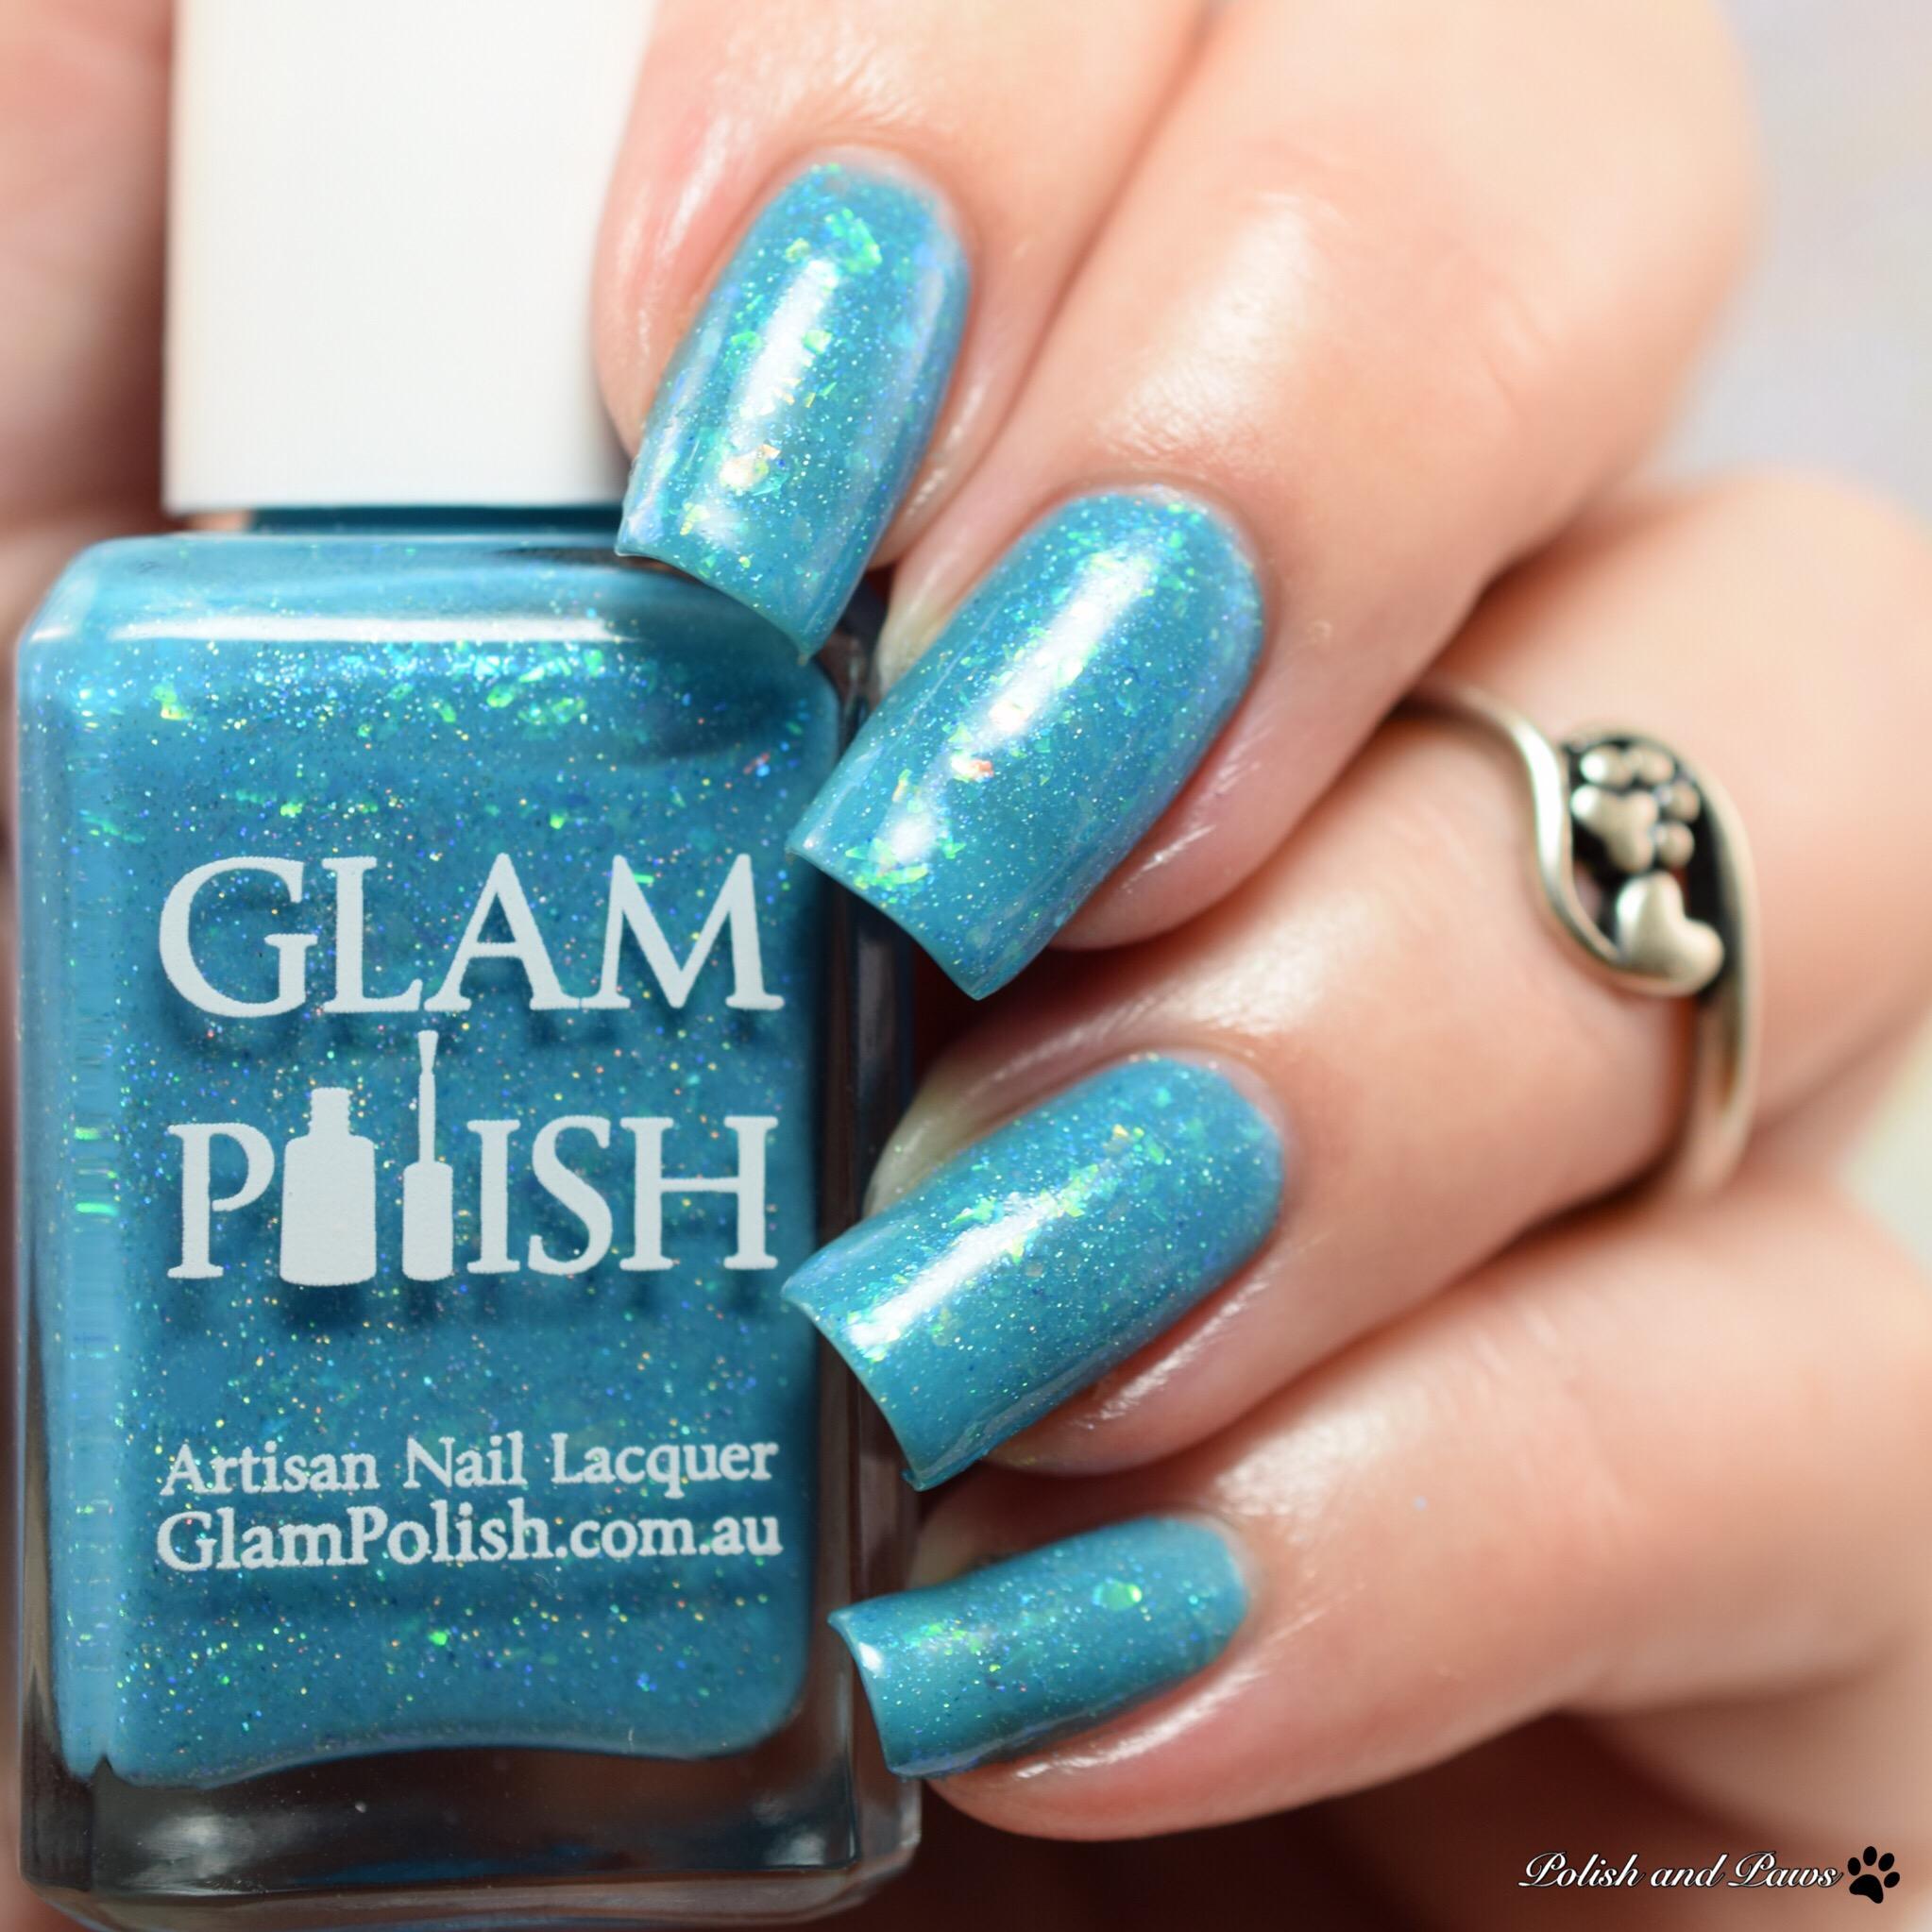 Glam Polish Summer Lovin' Had me a Blast